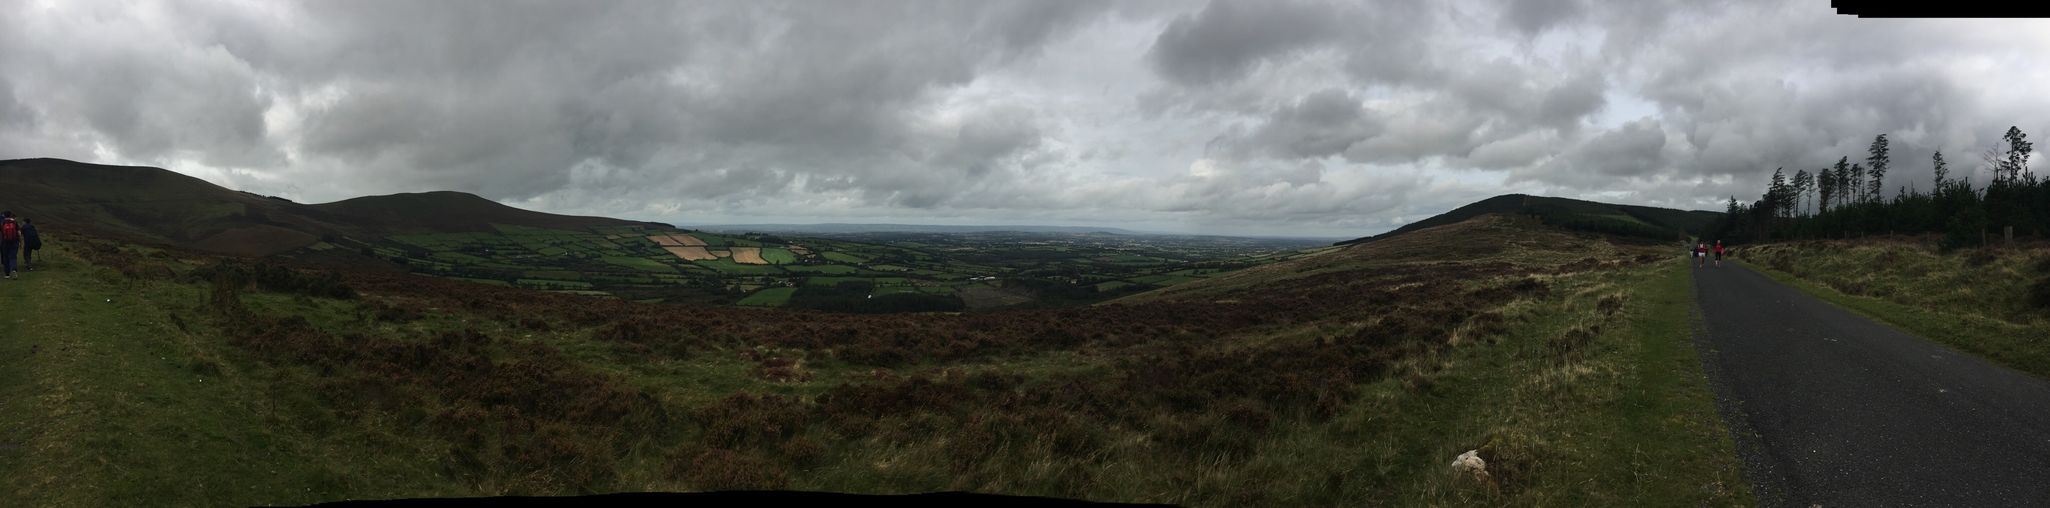 Irish countryside Landscape Mountain